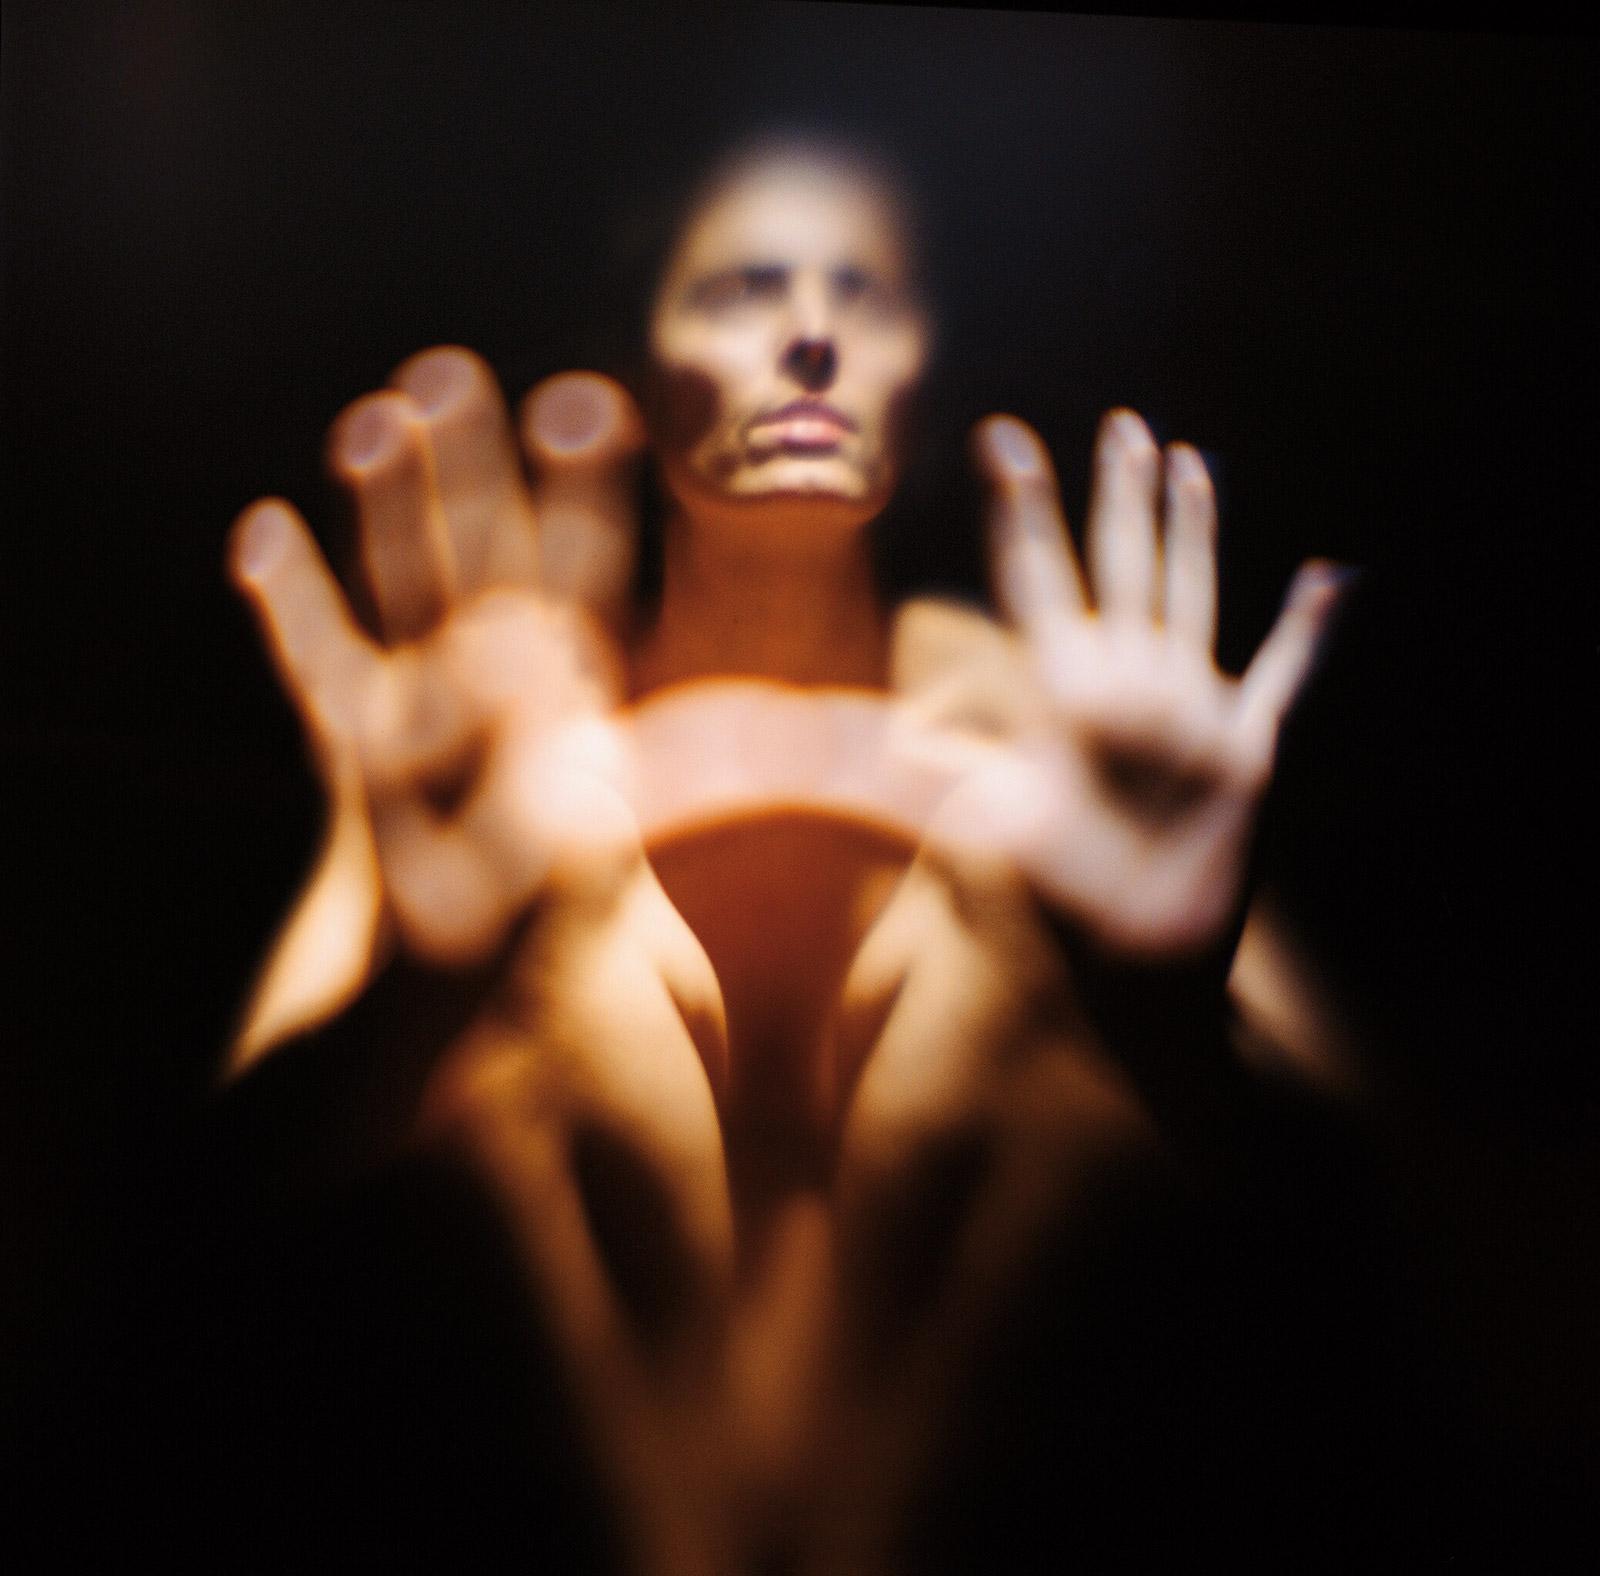 LA SEMILLA DE LA IMAGEN VI serie II. Fotografía analógica, 2009